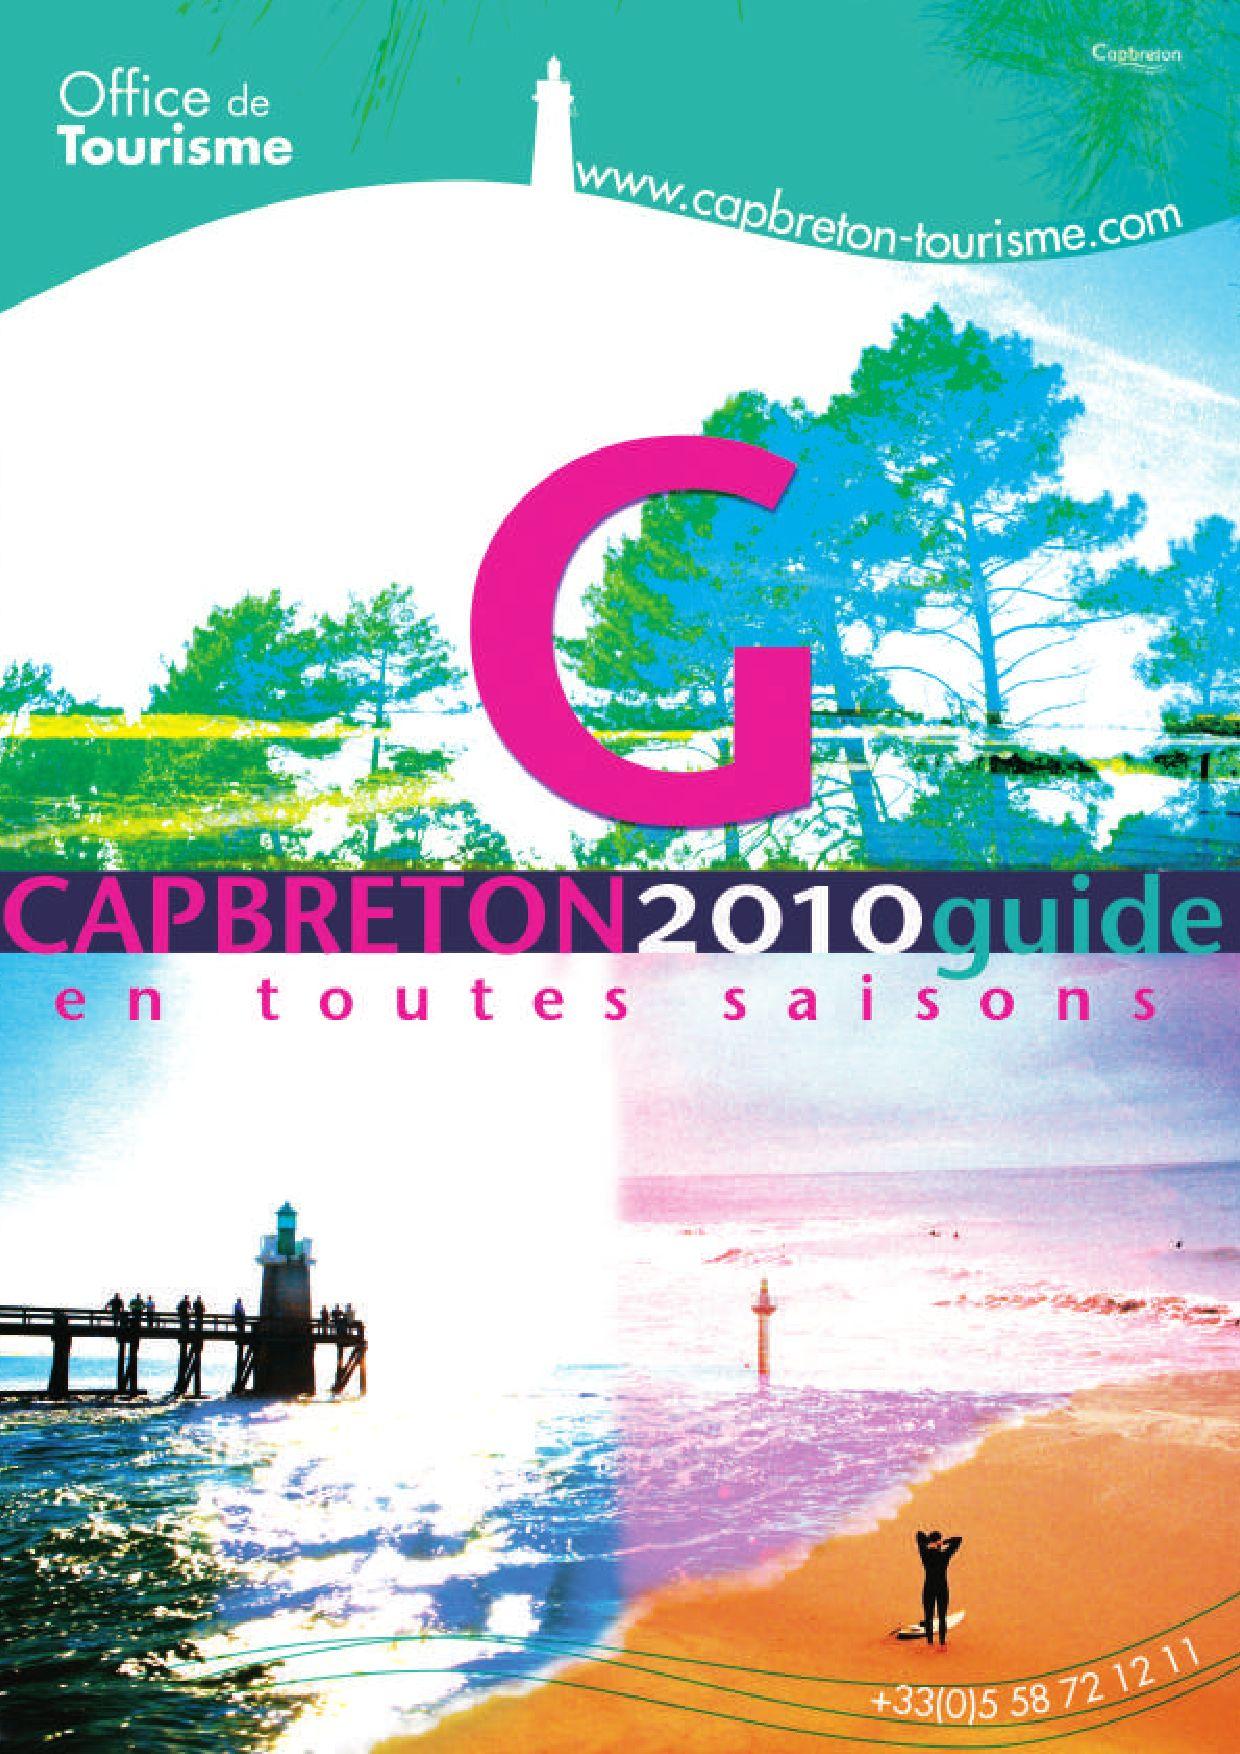 Ot capbreton guide 2010 by gmt editions issuu - Office de tourisme capbreton ...